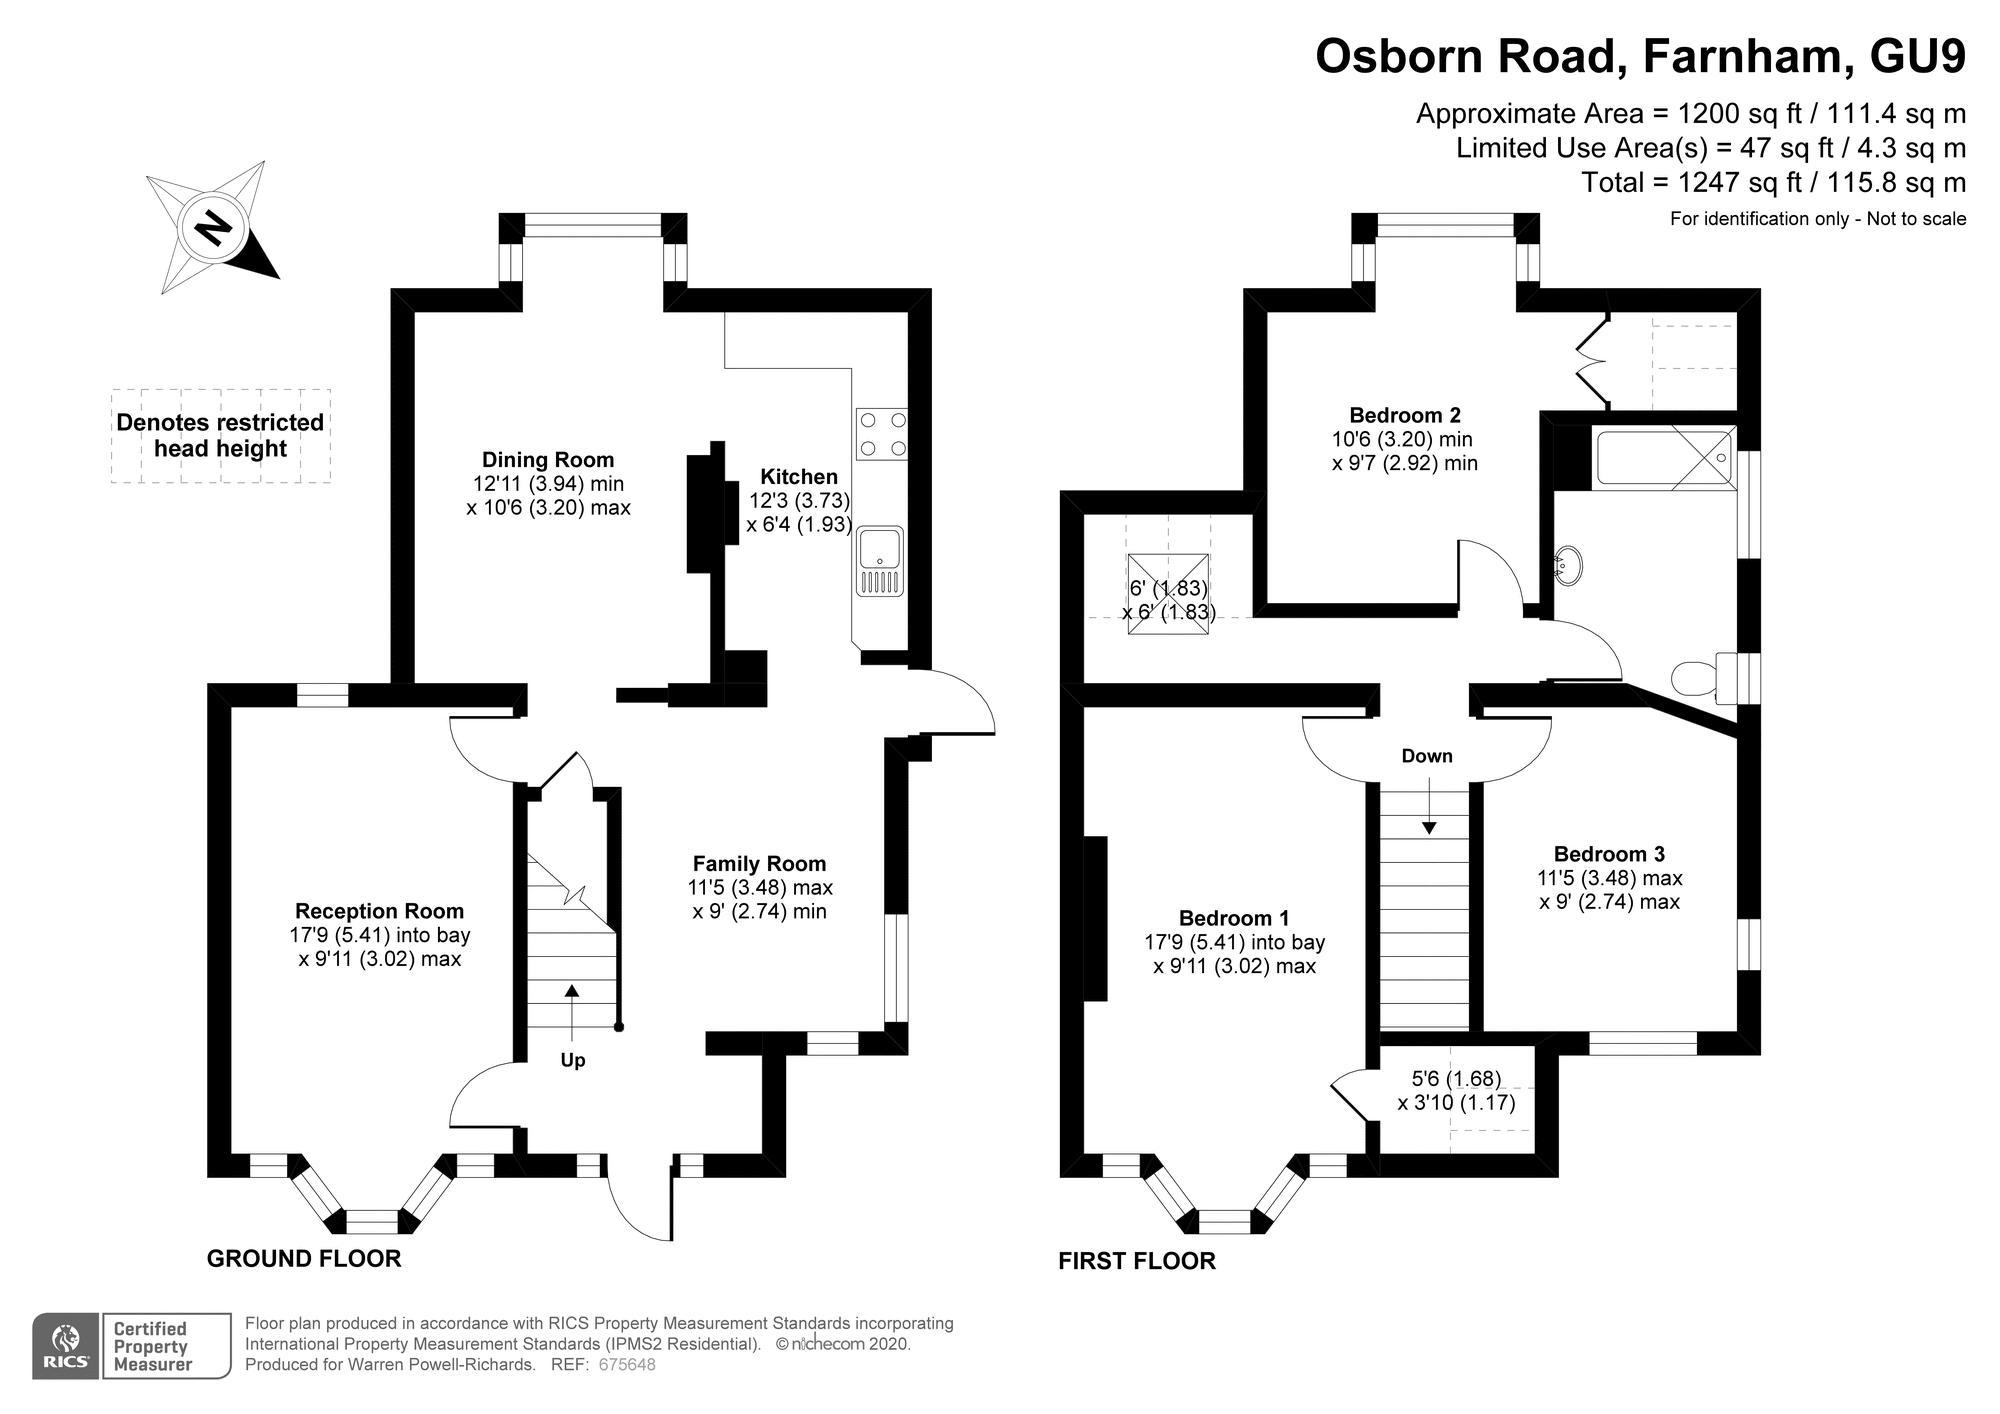 Osborn Road